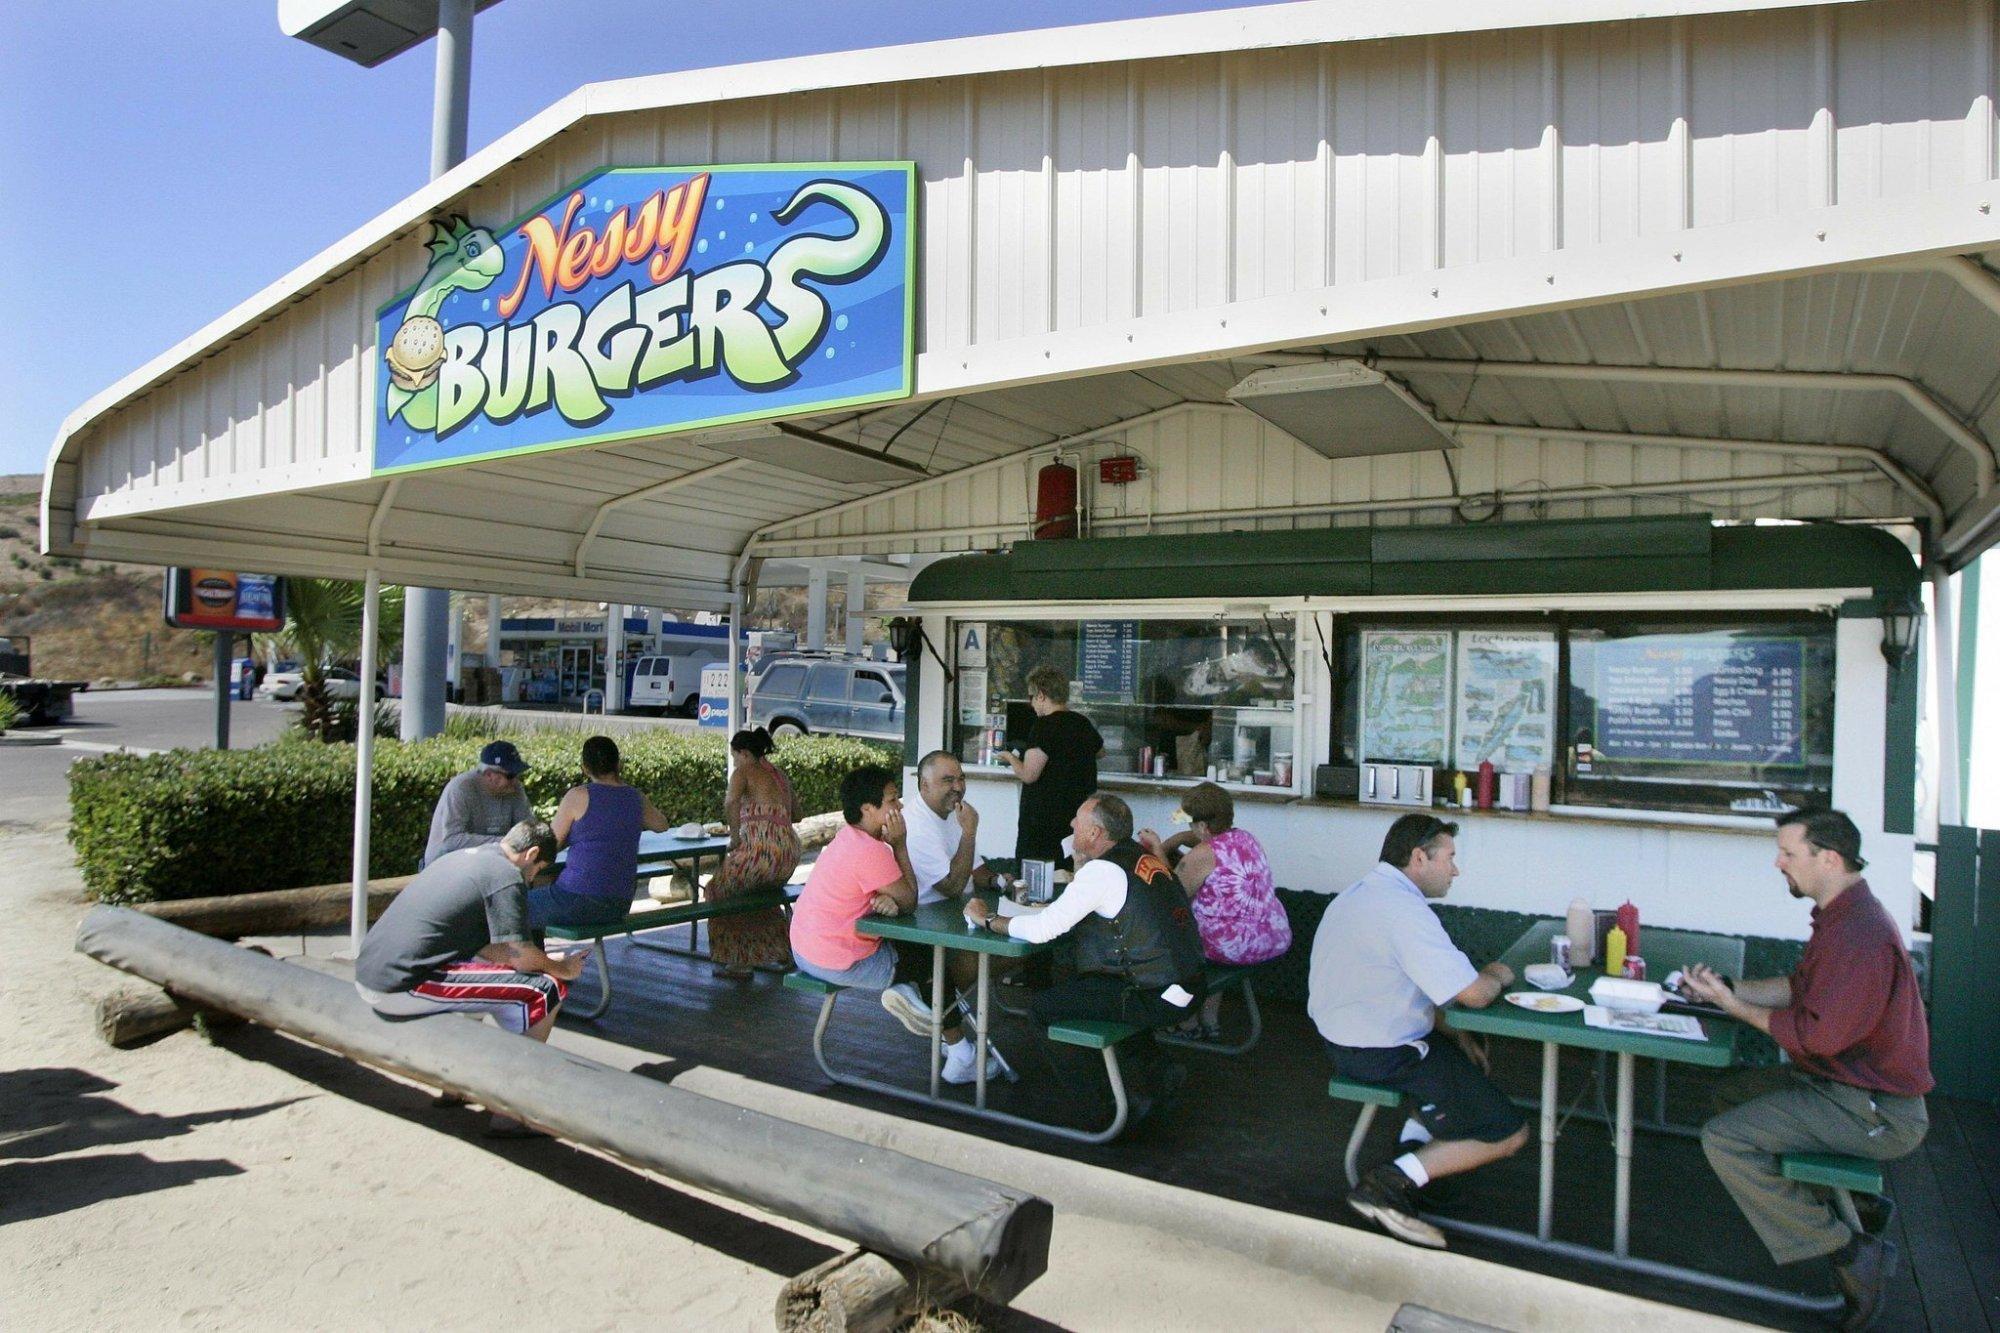 sdut-nessy-burgers-fallbrook-disappears-will-live-again-2012apr10.jpg